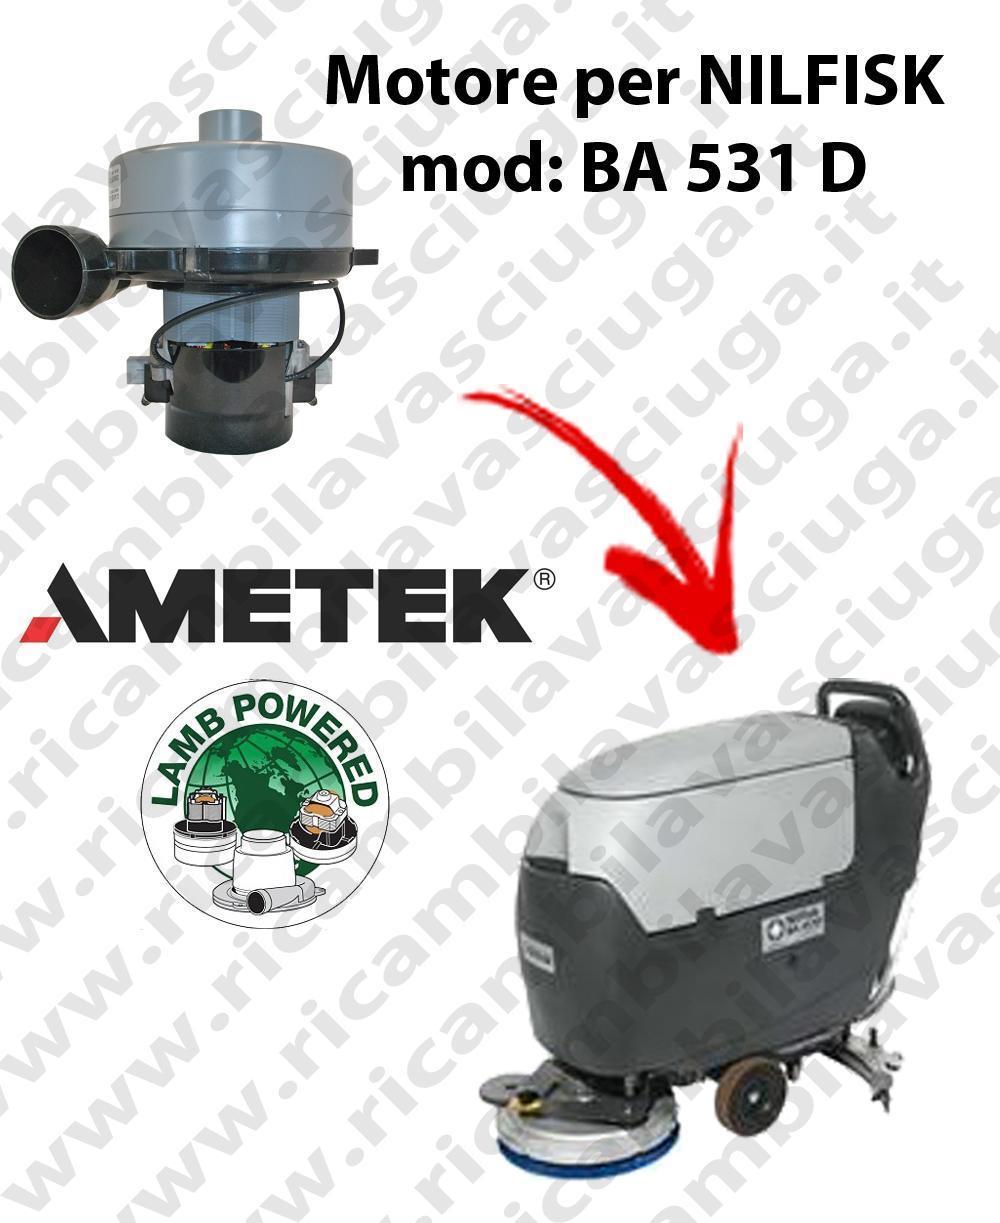 BA 531 D Vacuum motor LAMB AMETEK for scrubber dryer NILFISK